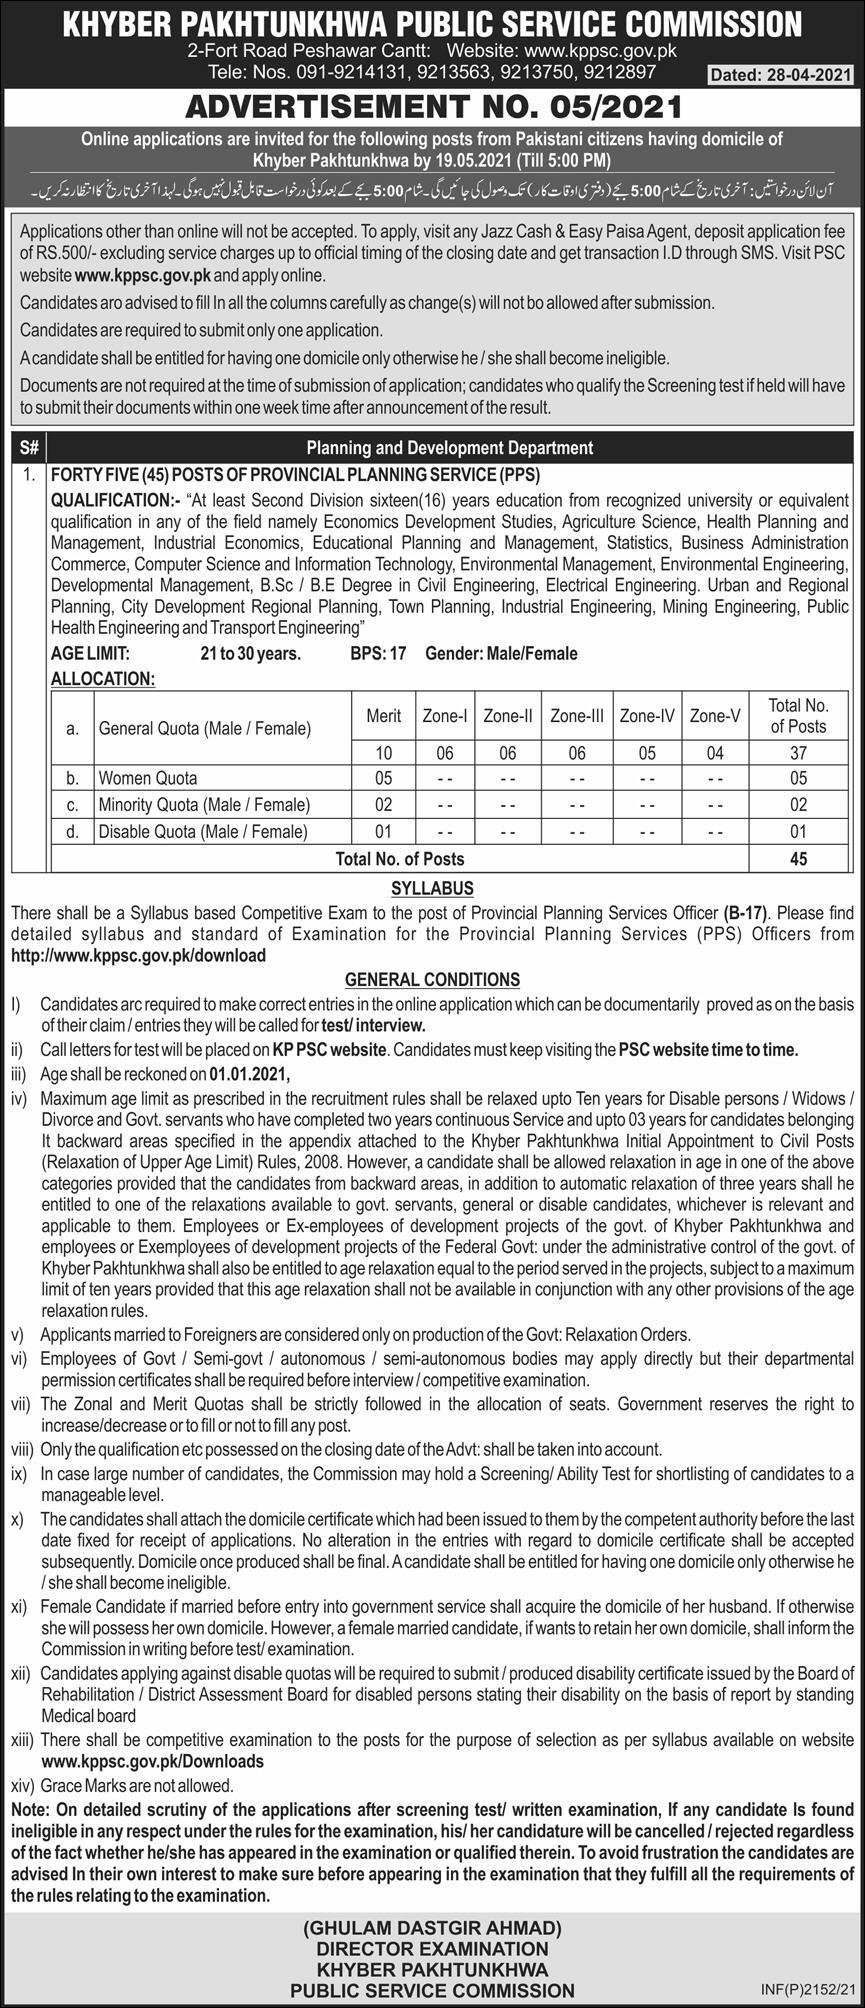 Khyber Pakhtunkhwa Public Service Commission (KPPSC) Jobs 30th April 2021